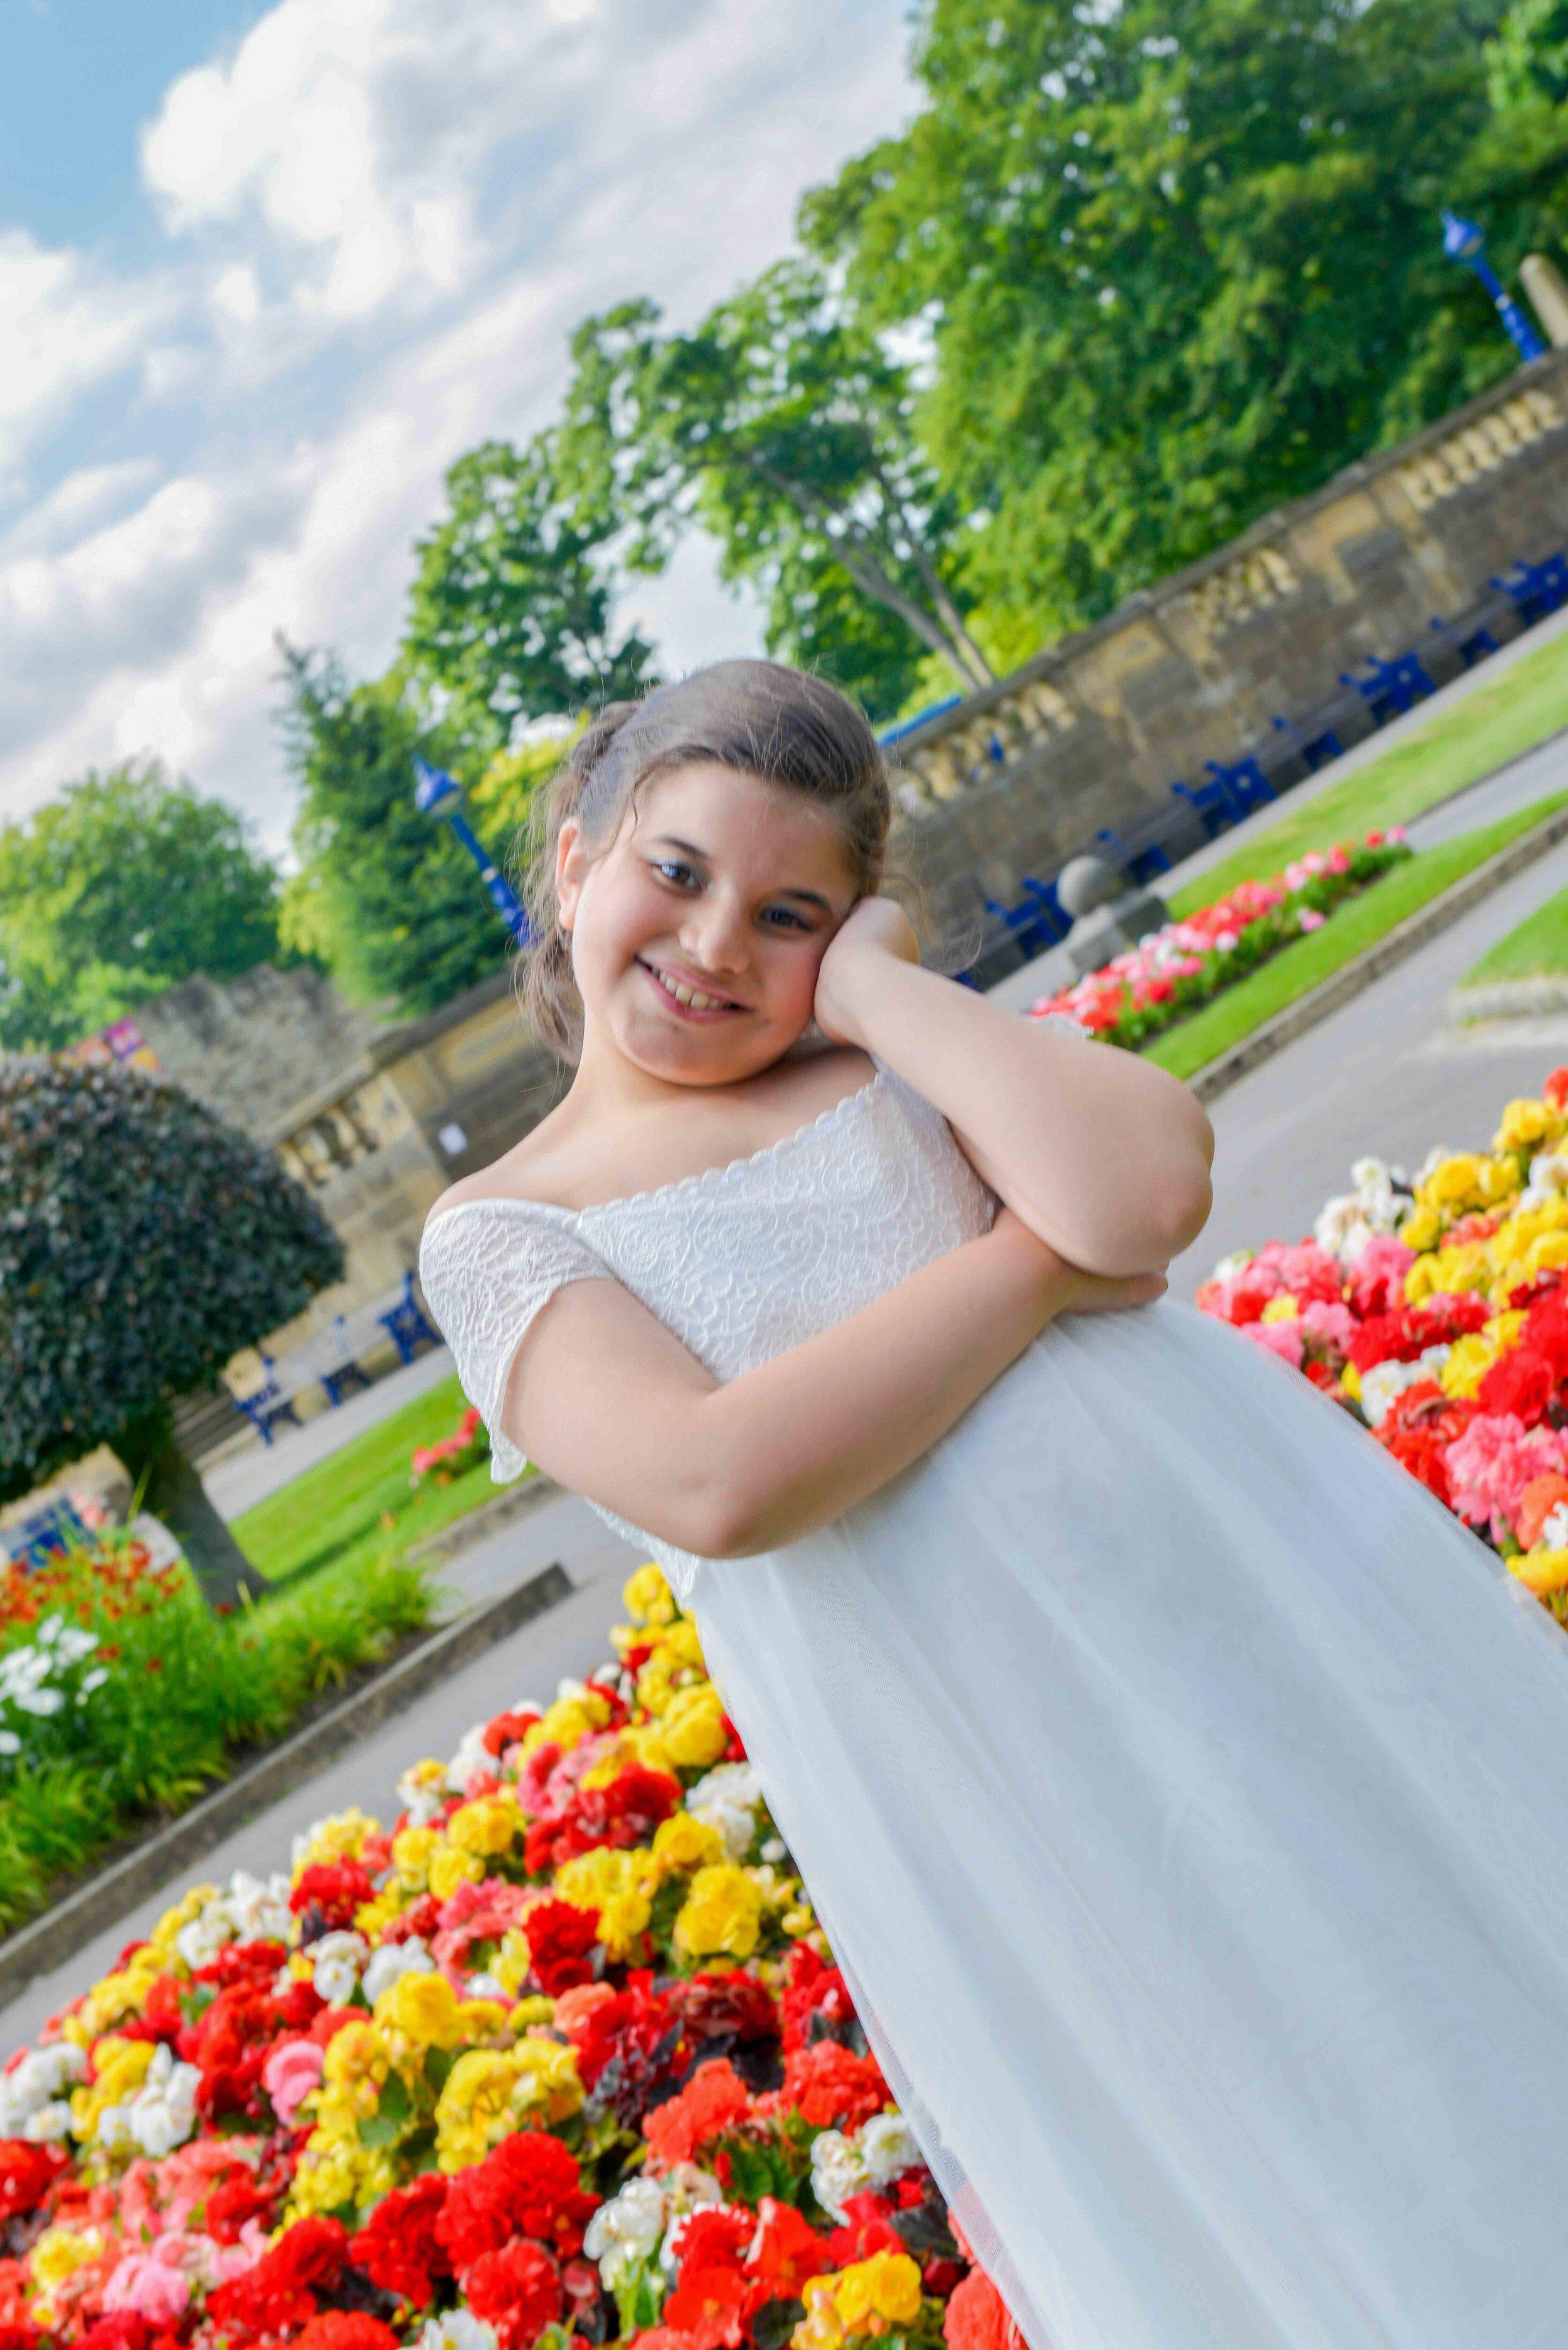 Ashley 2016, Shy B Photography location shoot, Lister Park, Bradford, West Yorkshire